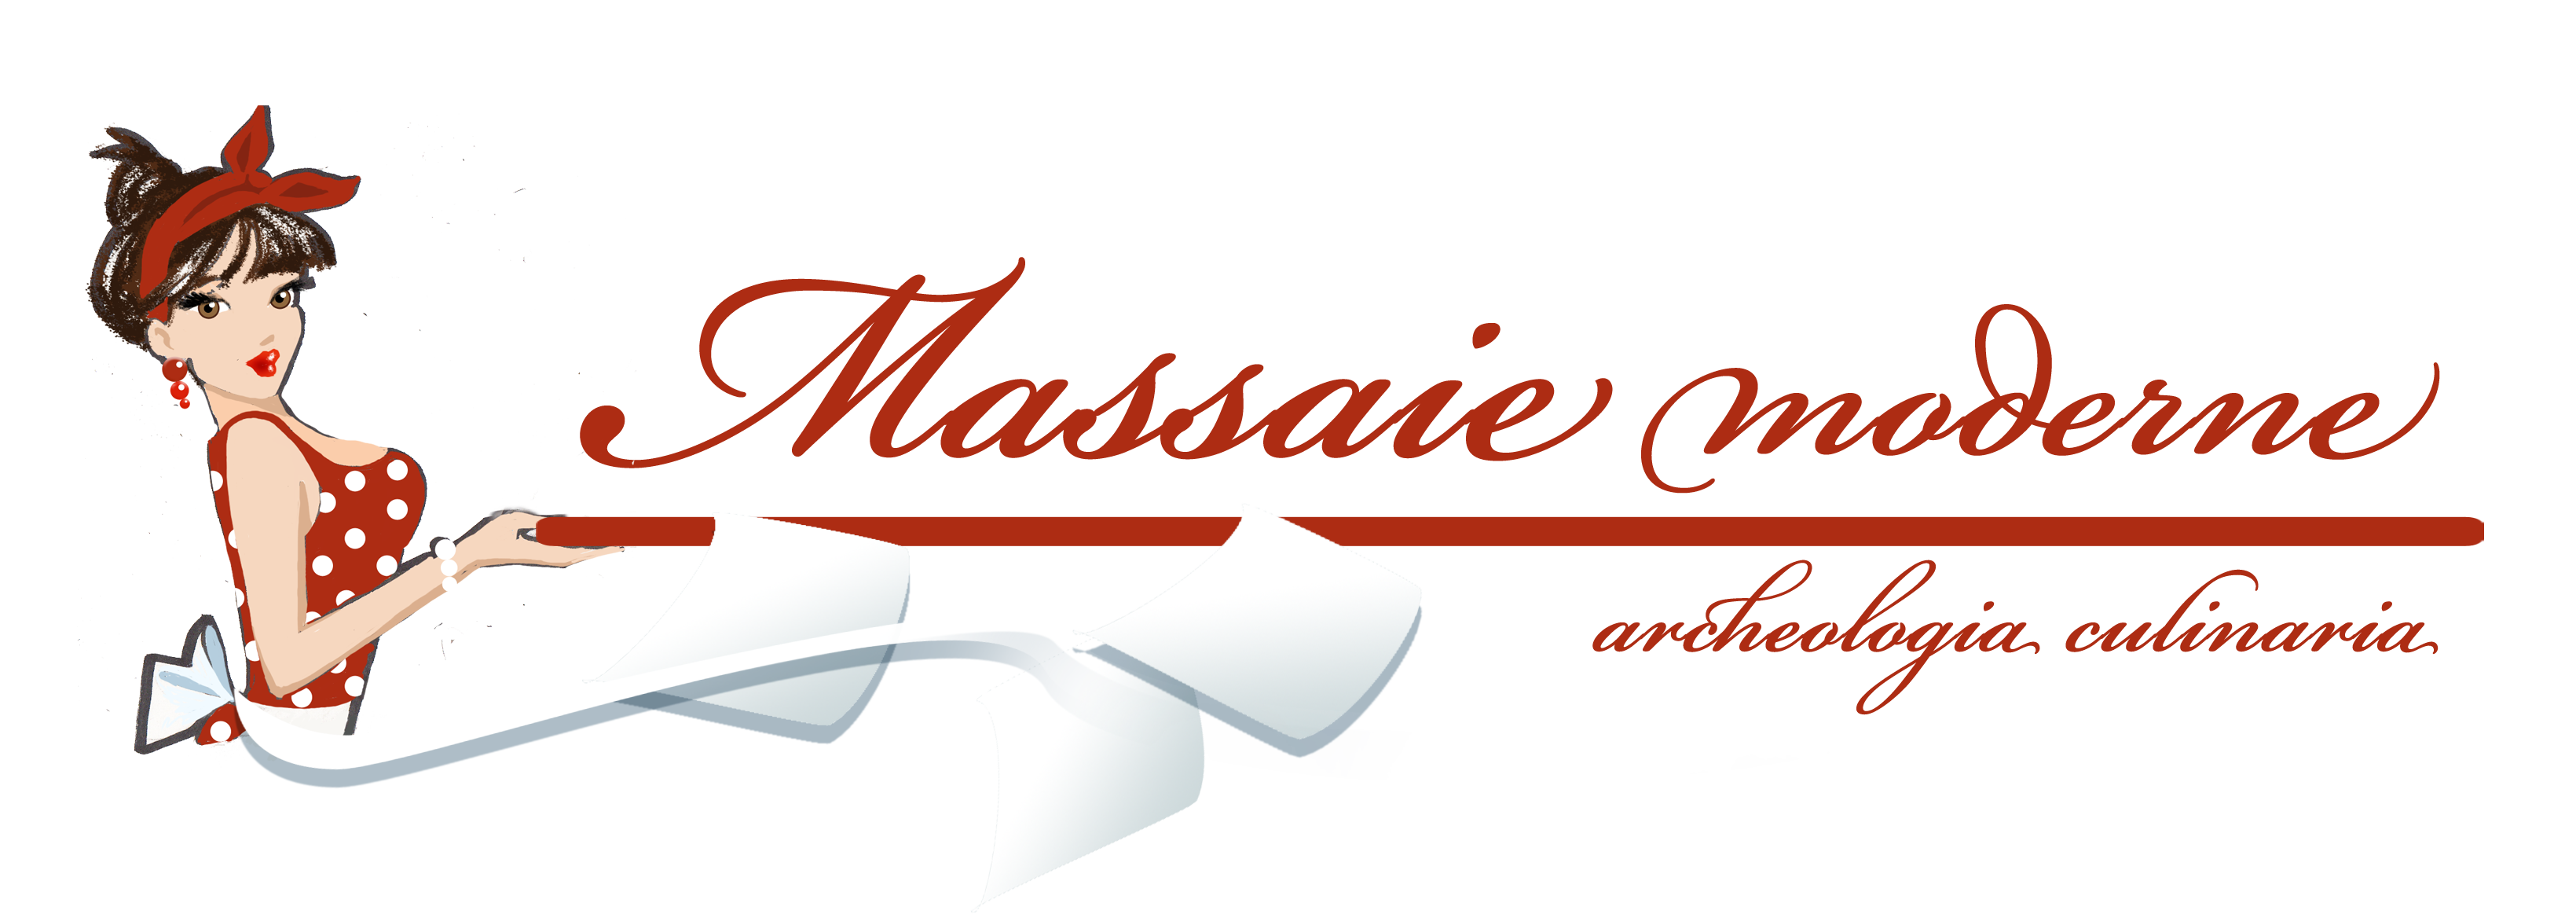 Massaie Moderne - Ricette d'altri tempi